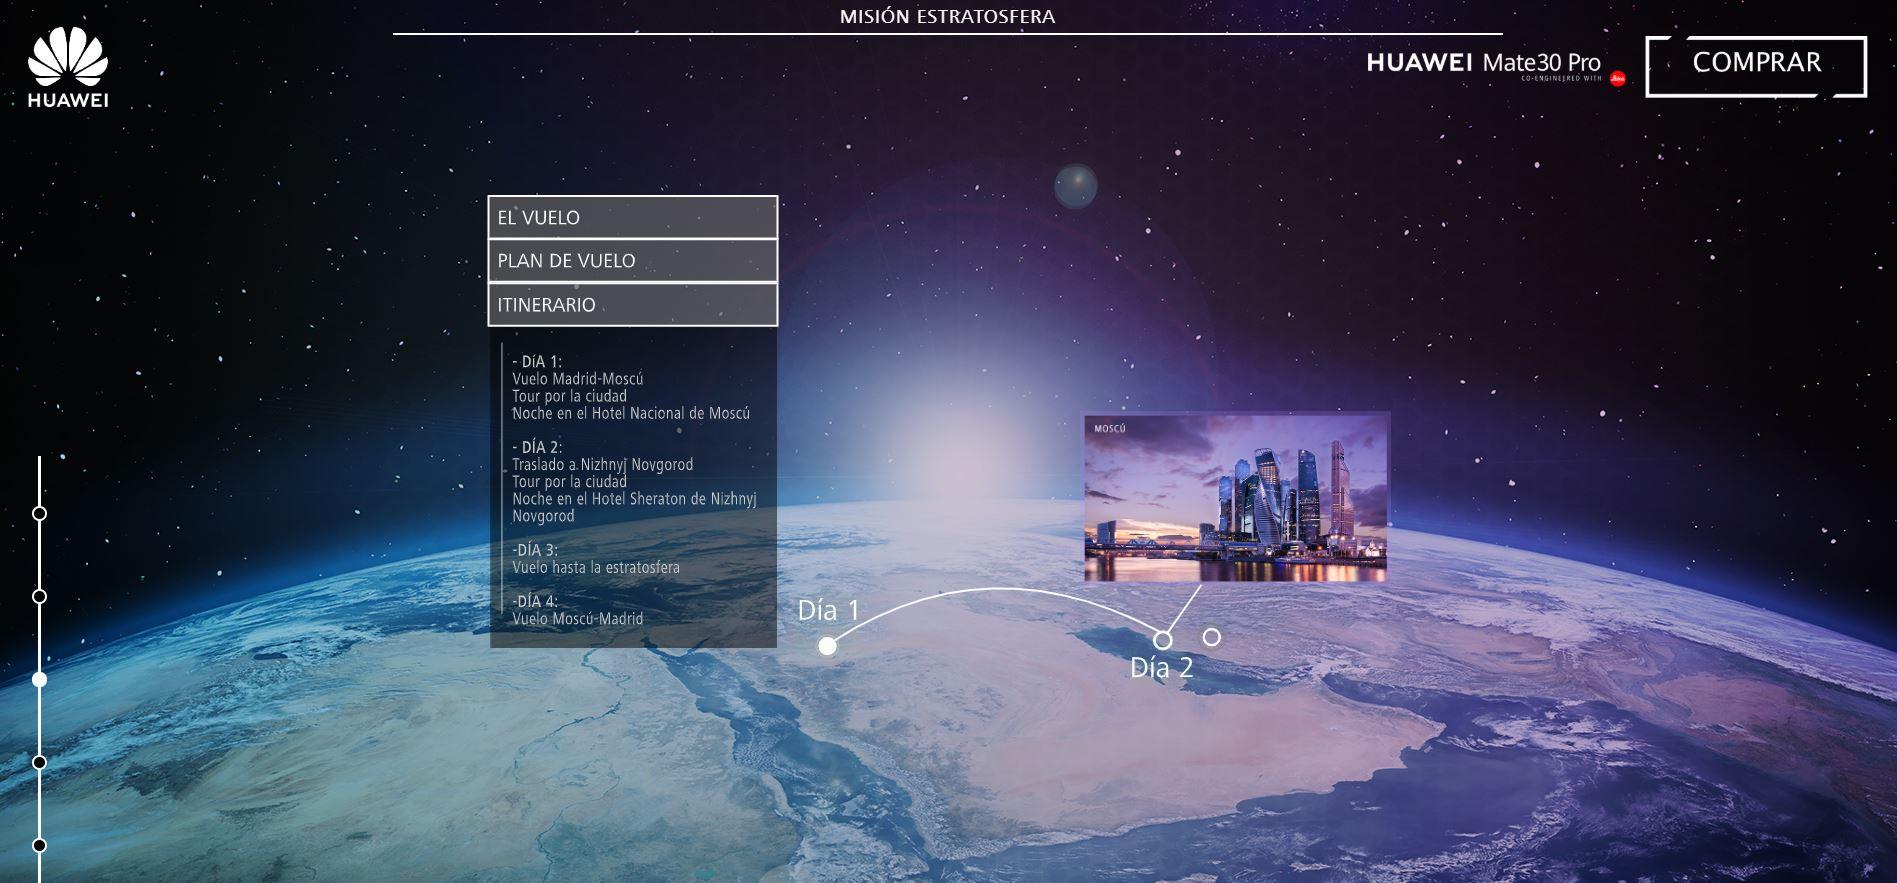 Misión Estratosfera: Huawei regala vuelo en avión de combate supersónico